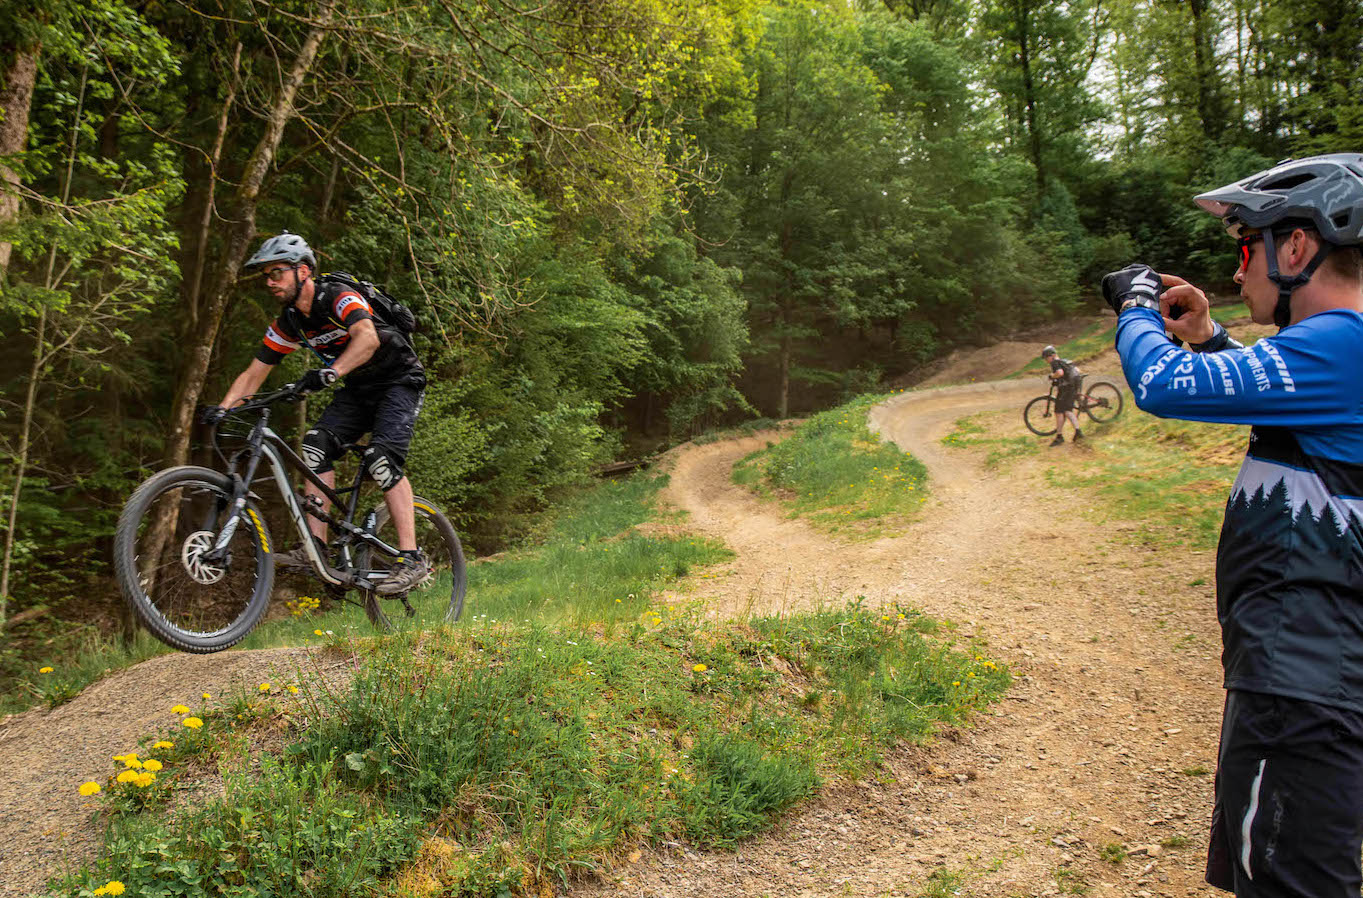 MTB Sprung & Drop Kurs im Trailpark Erbeskopf - Fahrtechnik Training Rock my Trail Bikeschule - 2